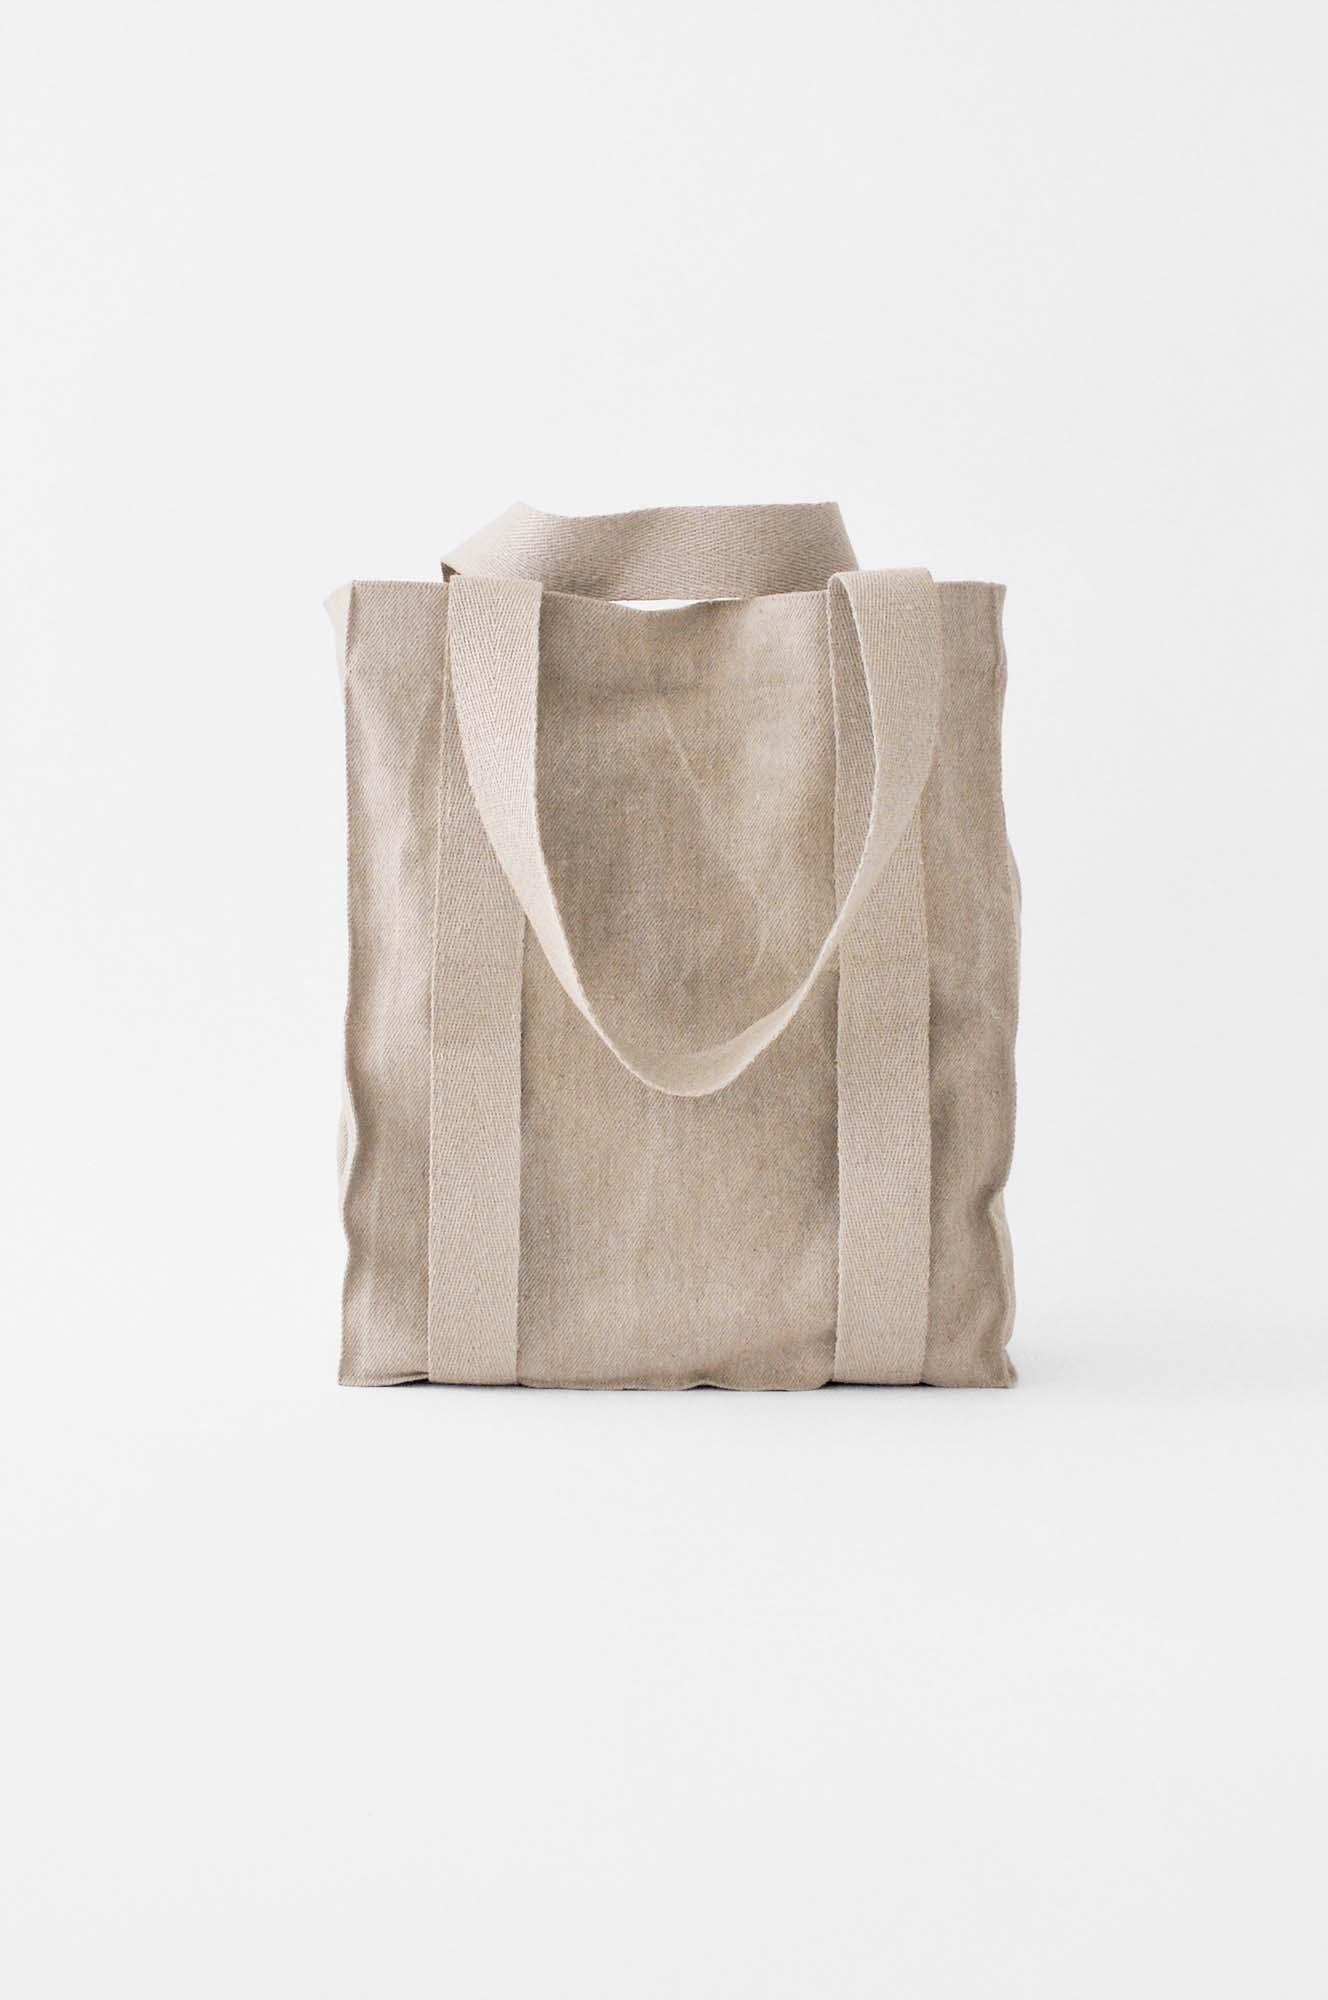 Linen yoga tote bag | Lino Yoga Co.